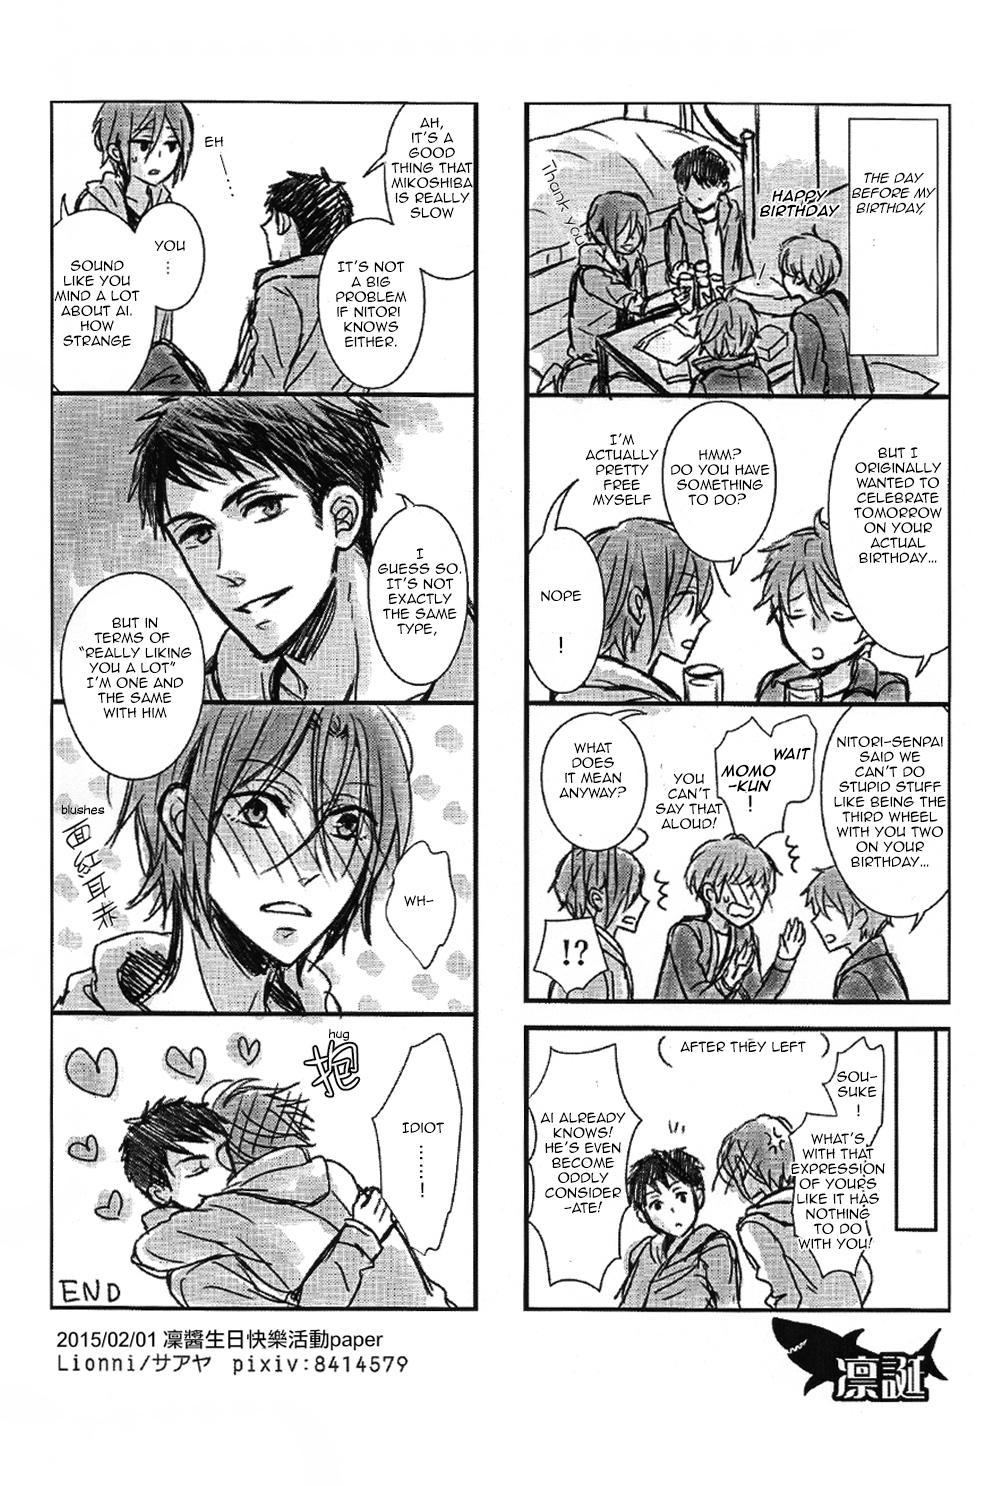 (Renai Jaws 4) [Lionni (Saaya)] 2-gatsu 2-ka no Hajimete | February Second for the First Time (Free!) [English] [Carrot-Bunny] 18